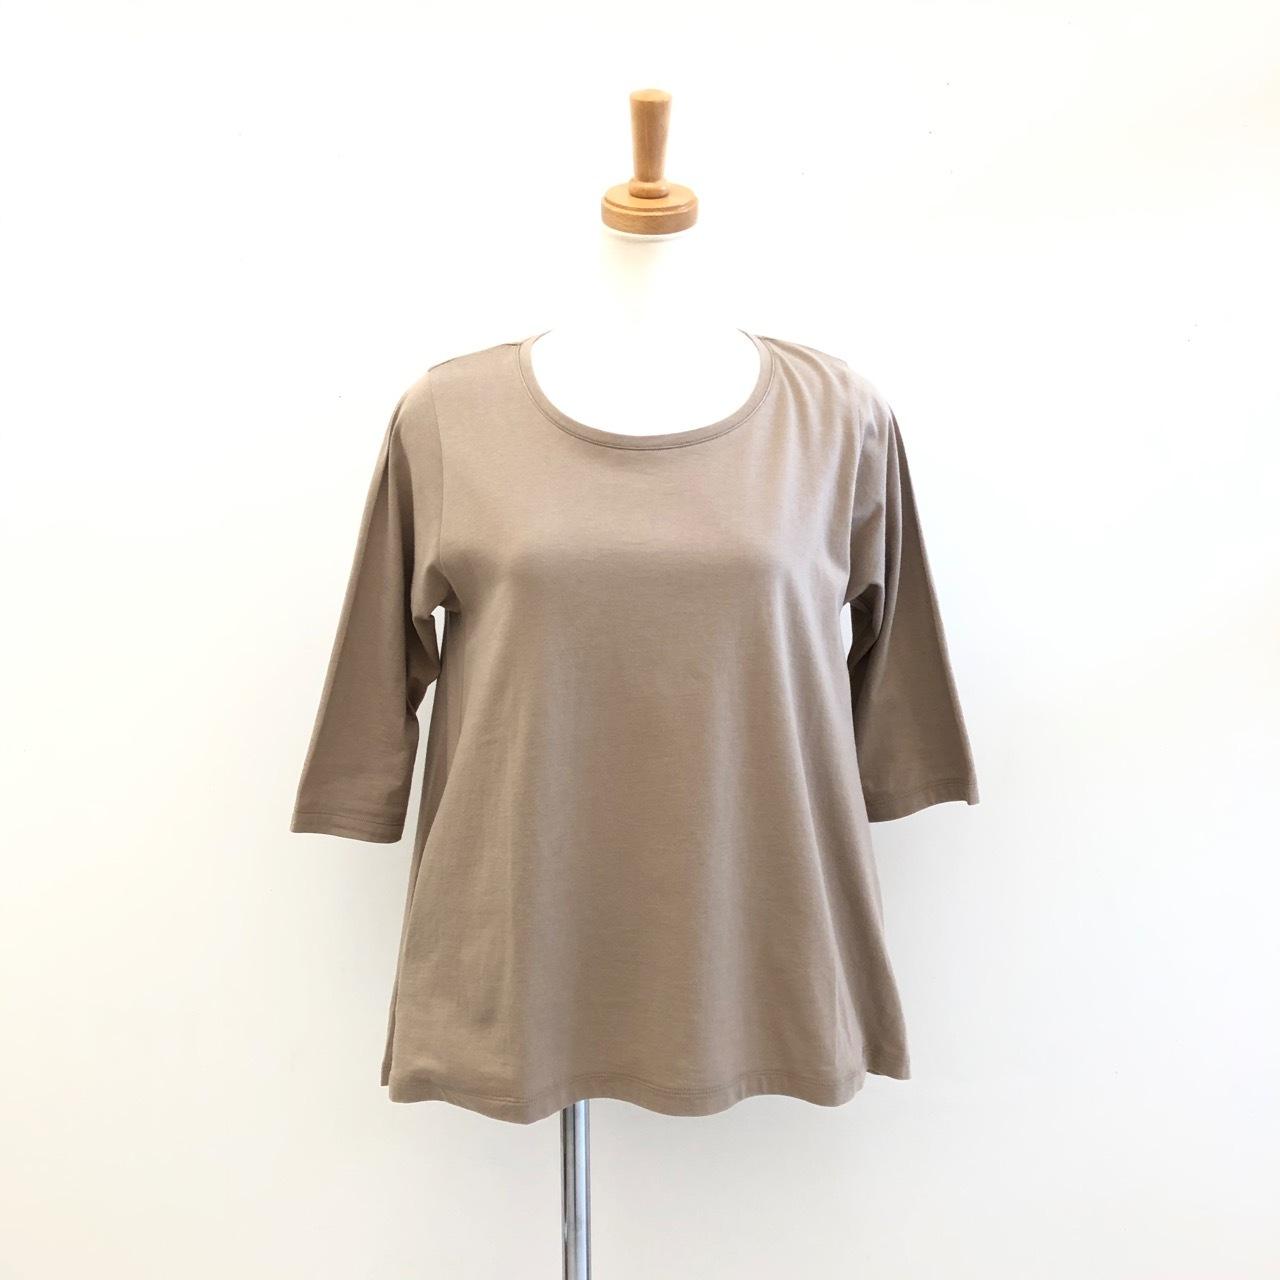 【 siro de labonte 】- R013220 - Tシャツ